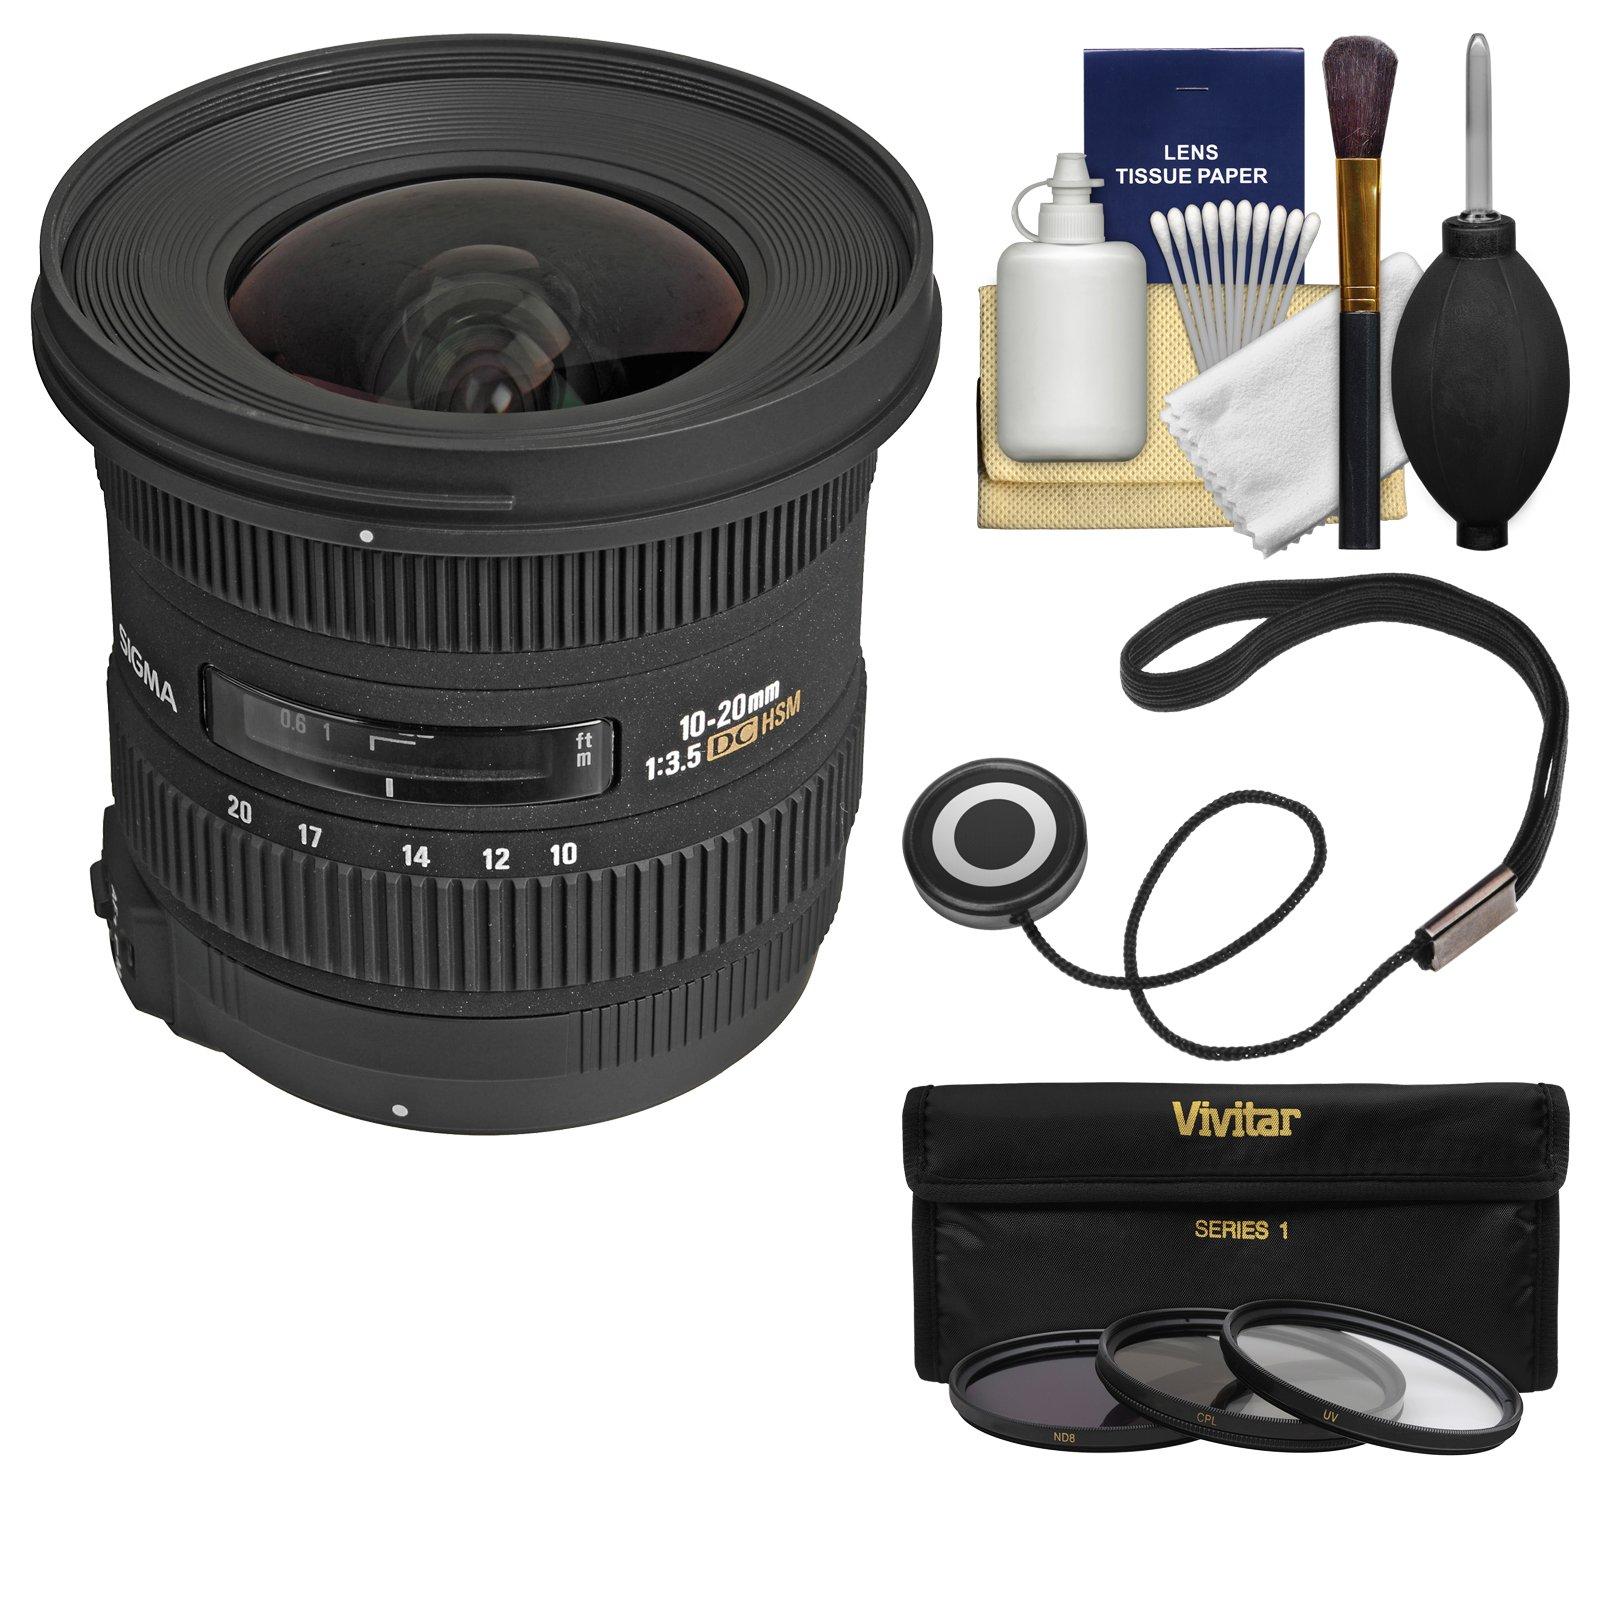 Sigma 10-20mm f/3.5 EX DC HSM Zoom Lens with 3 Filters Kit for Nikon D3300, D3400, D5500, D5600 D7100, D7200, D7500 DSLR Cameras